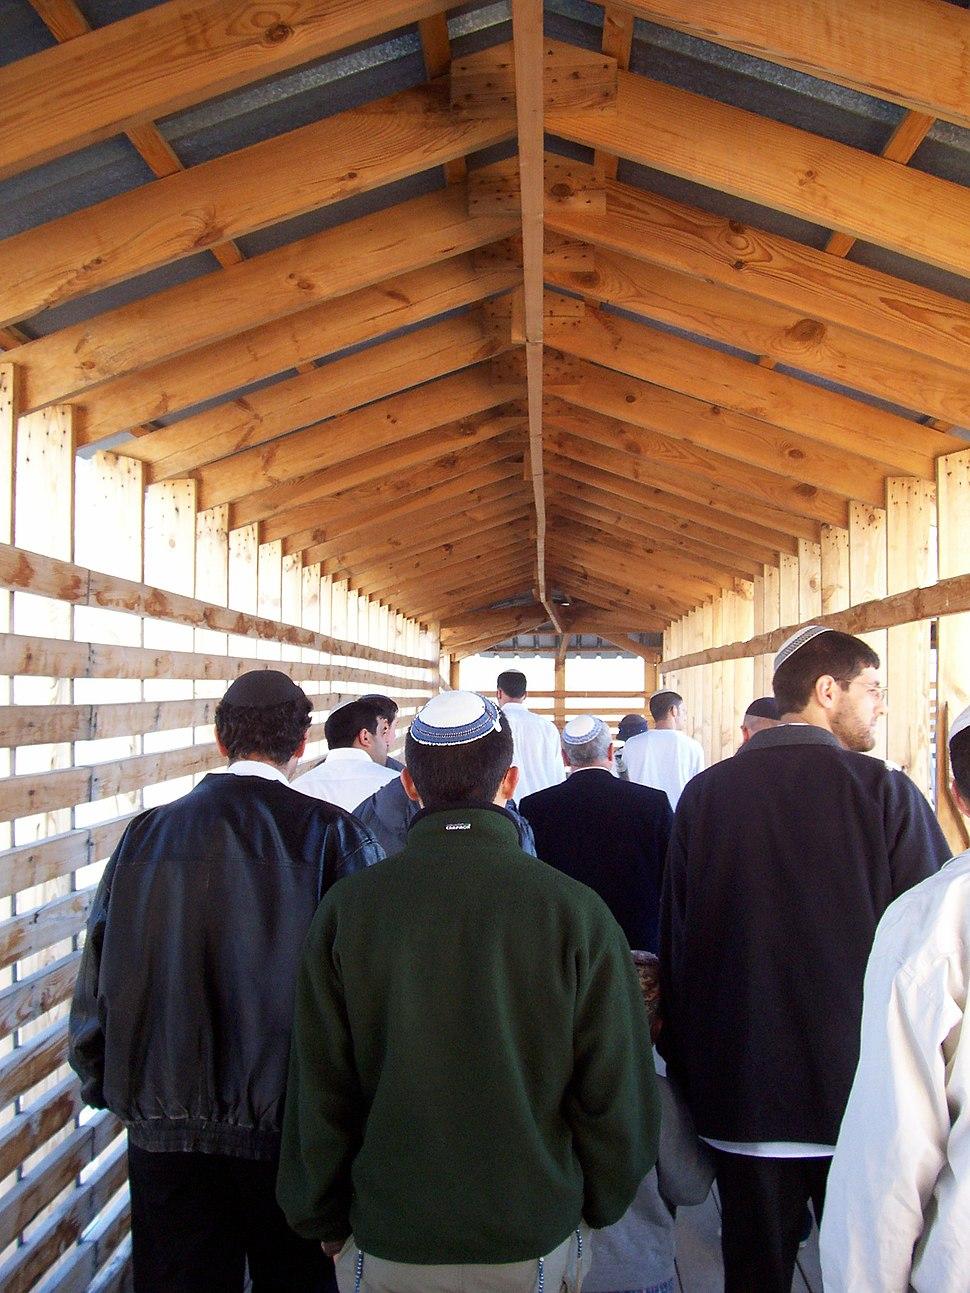 Jews entering temple mount